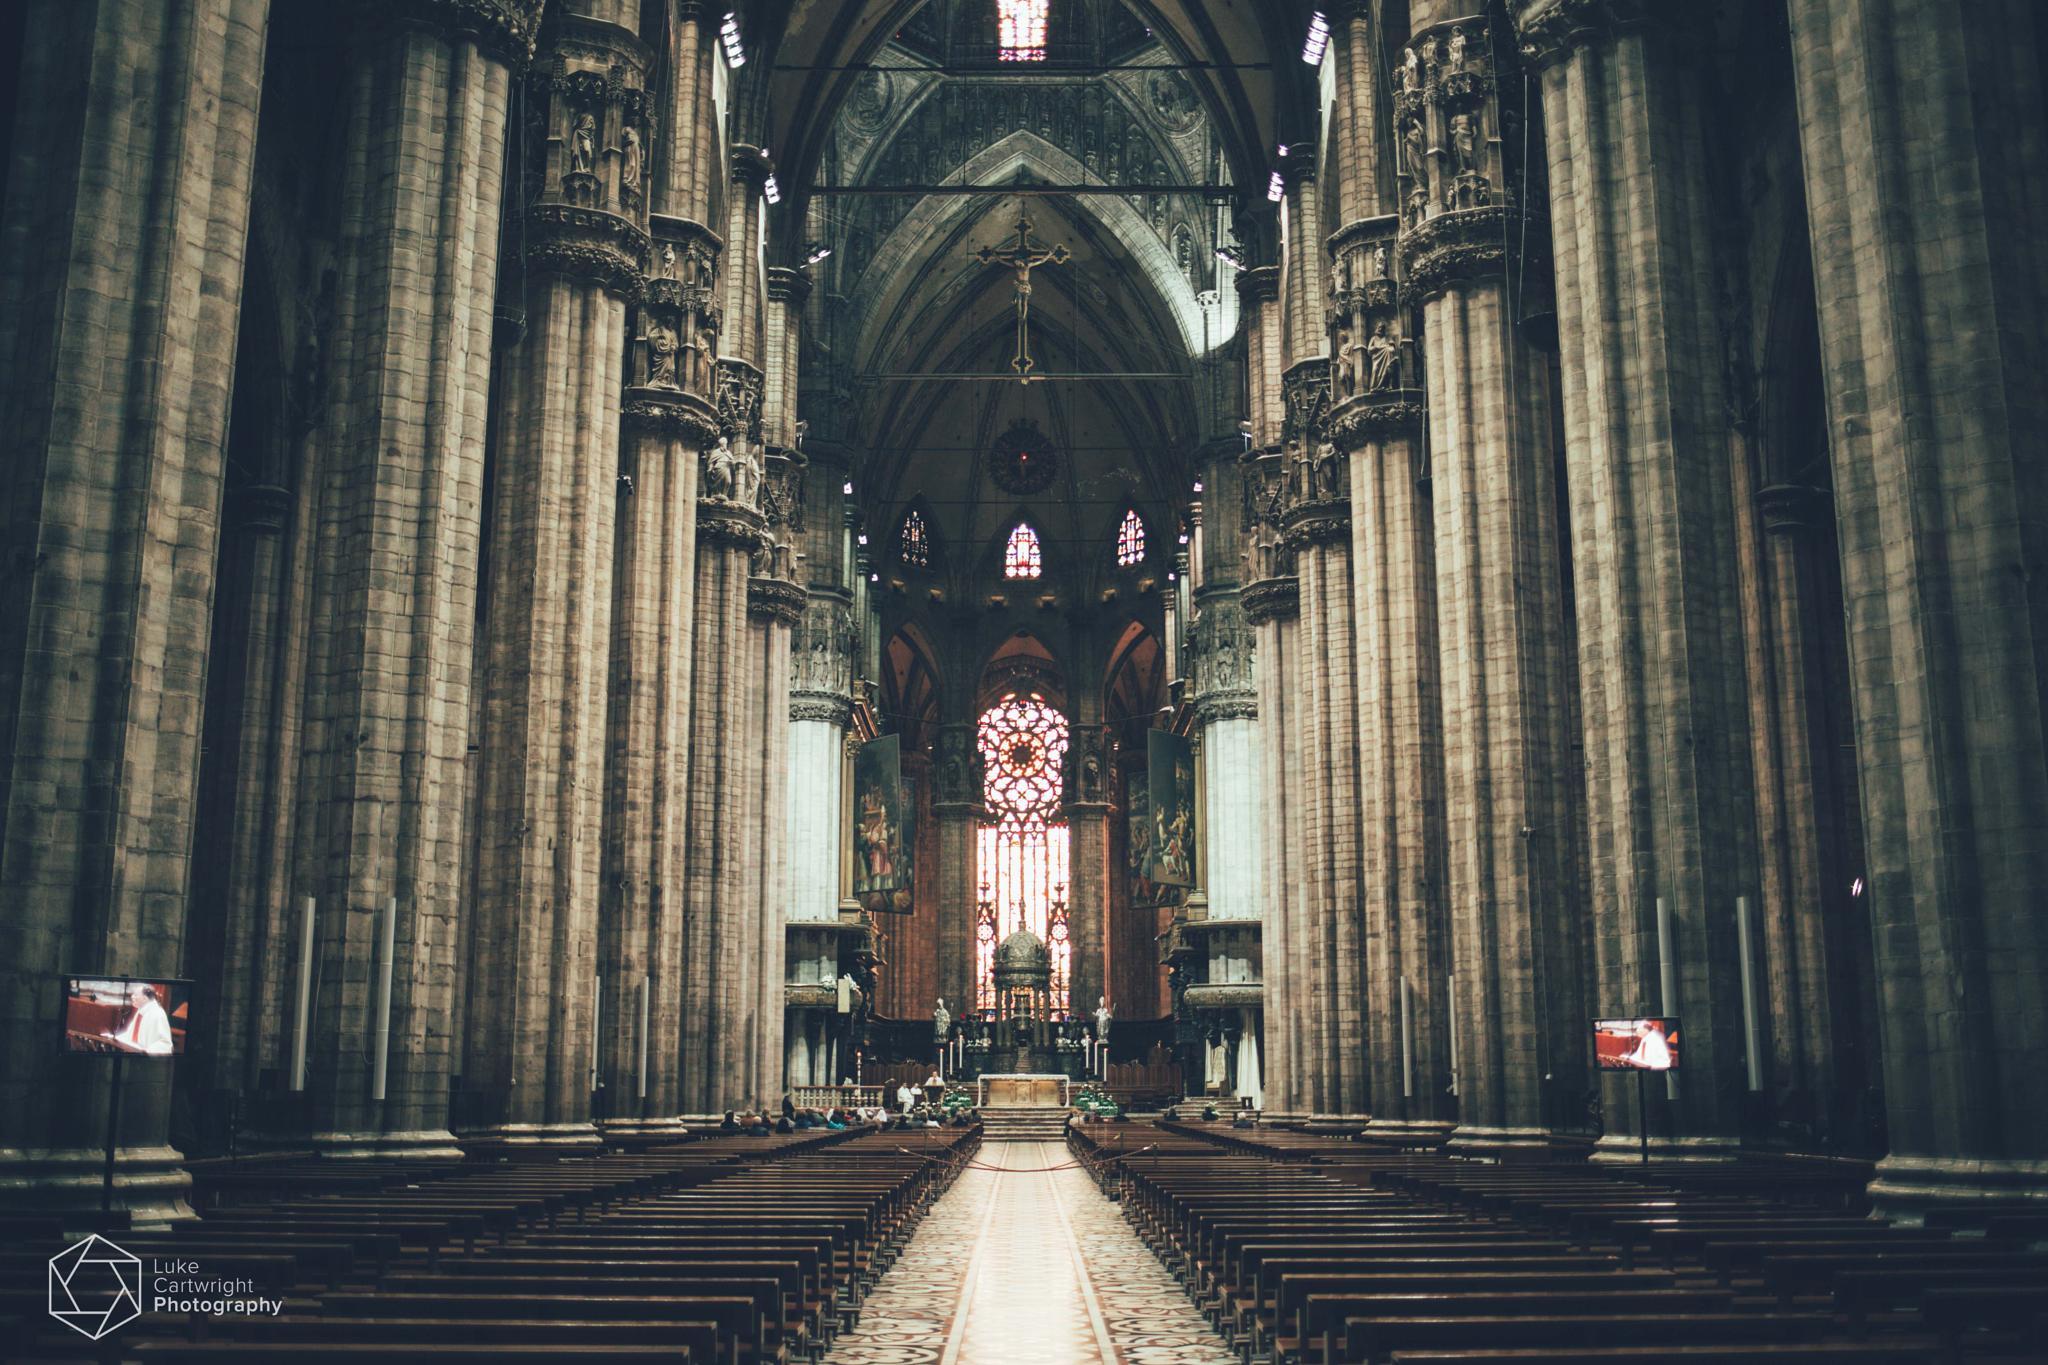 Duomo di Milano|5DMKiii by Luke Cartwright